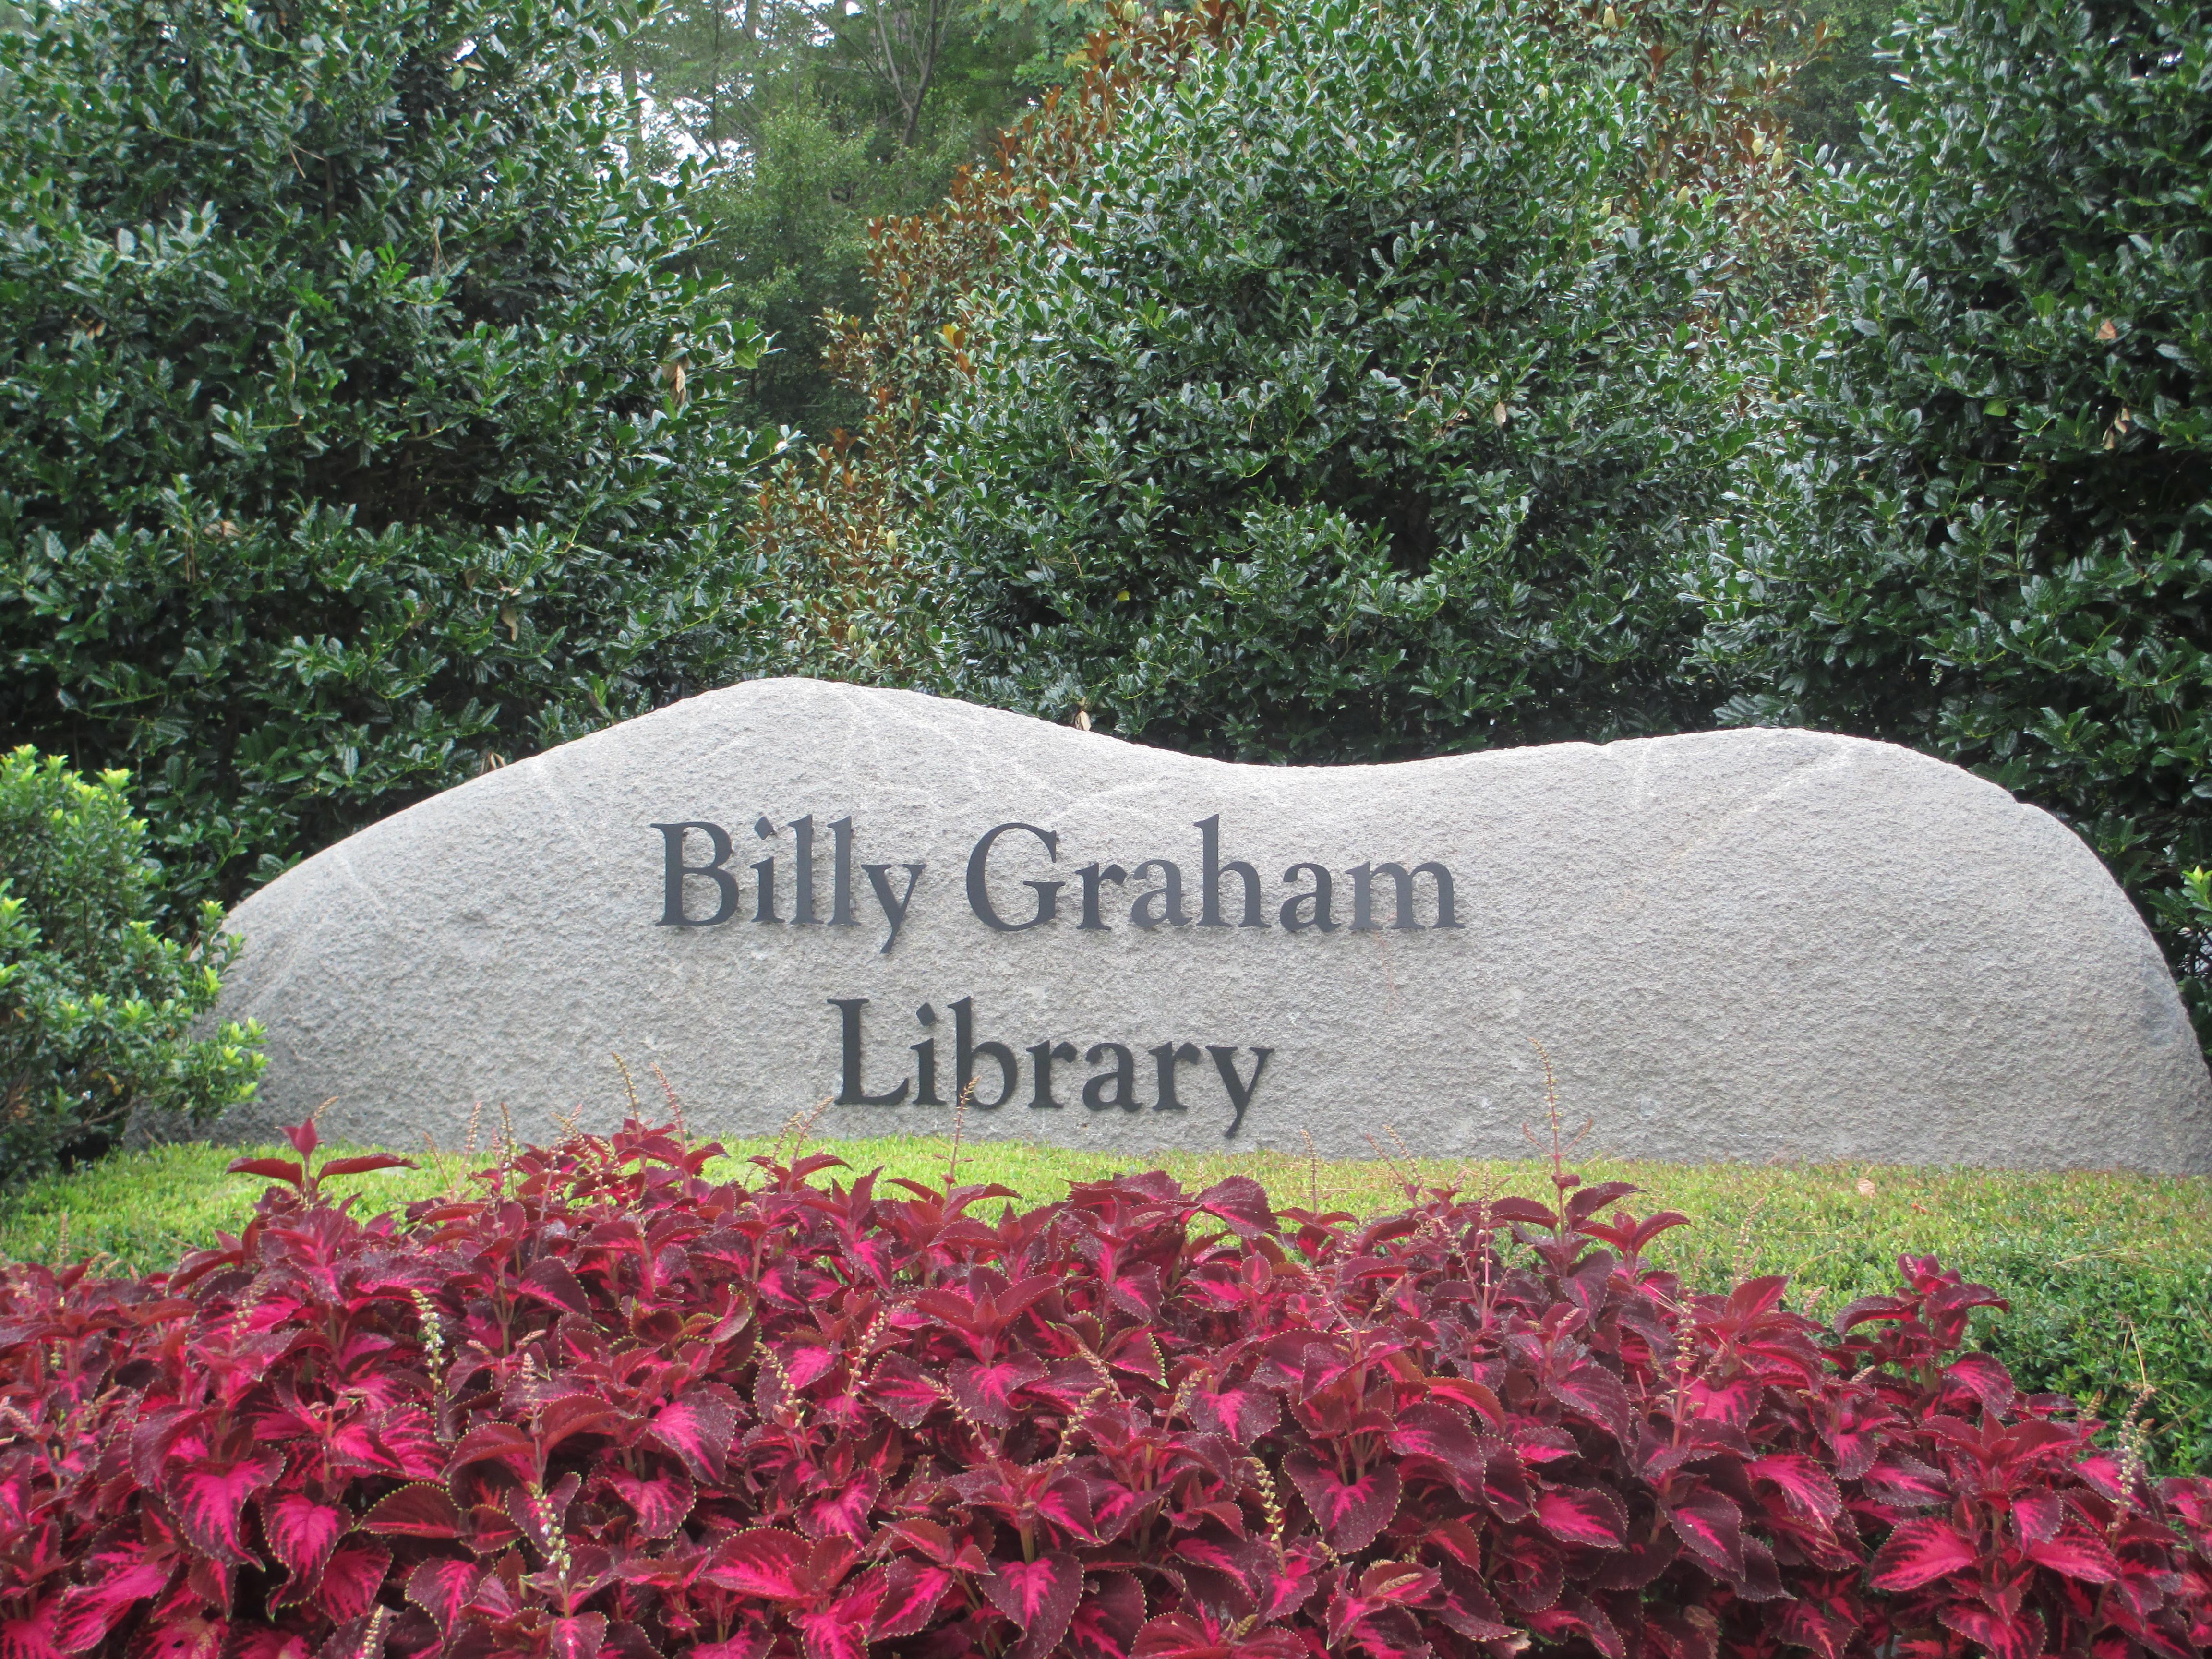 Billy Graham Library entrance sign, Charlotte, NC IMG 4201.JPG